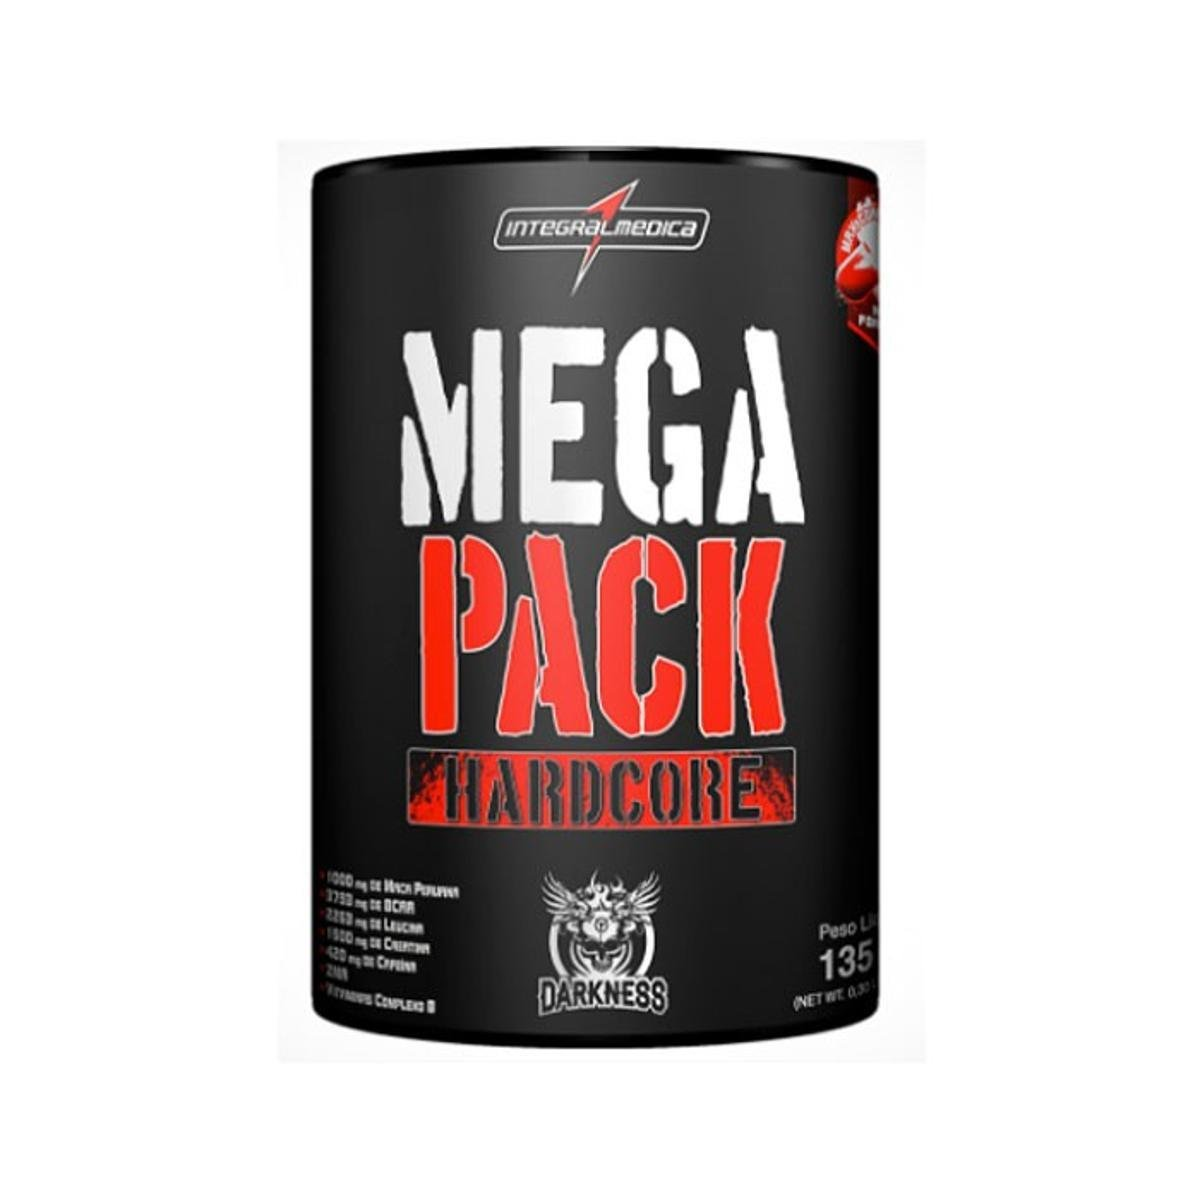 9bb0a4ed0094d Mega Pack 15 Packs Darkness - IntegralMédica - Sem Sabor - Compre Agora